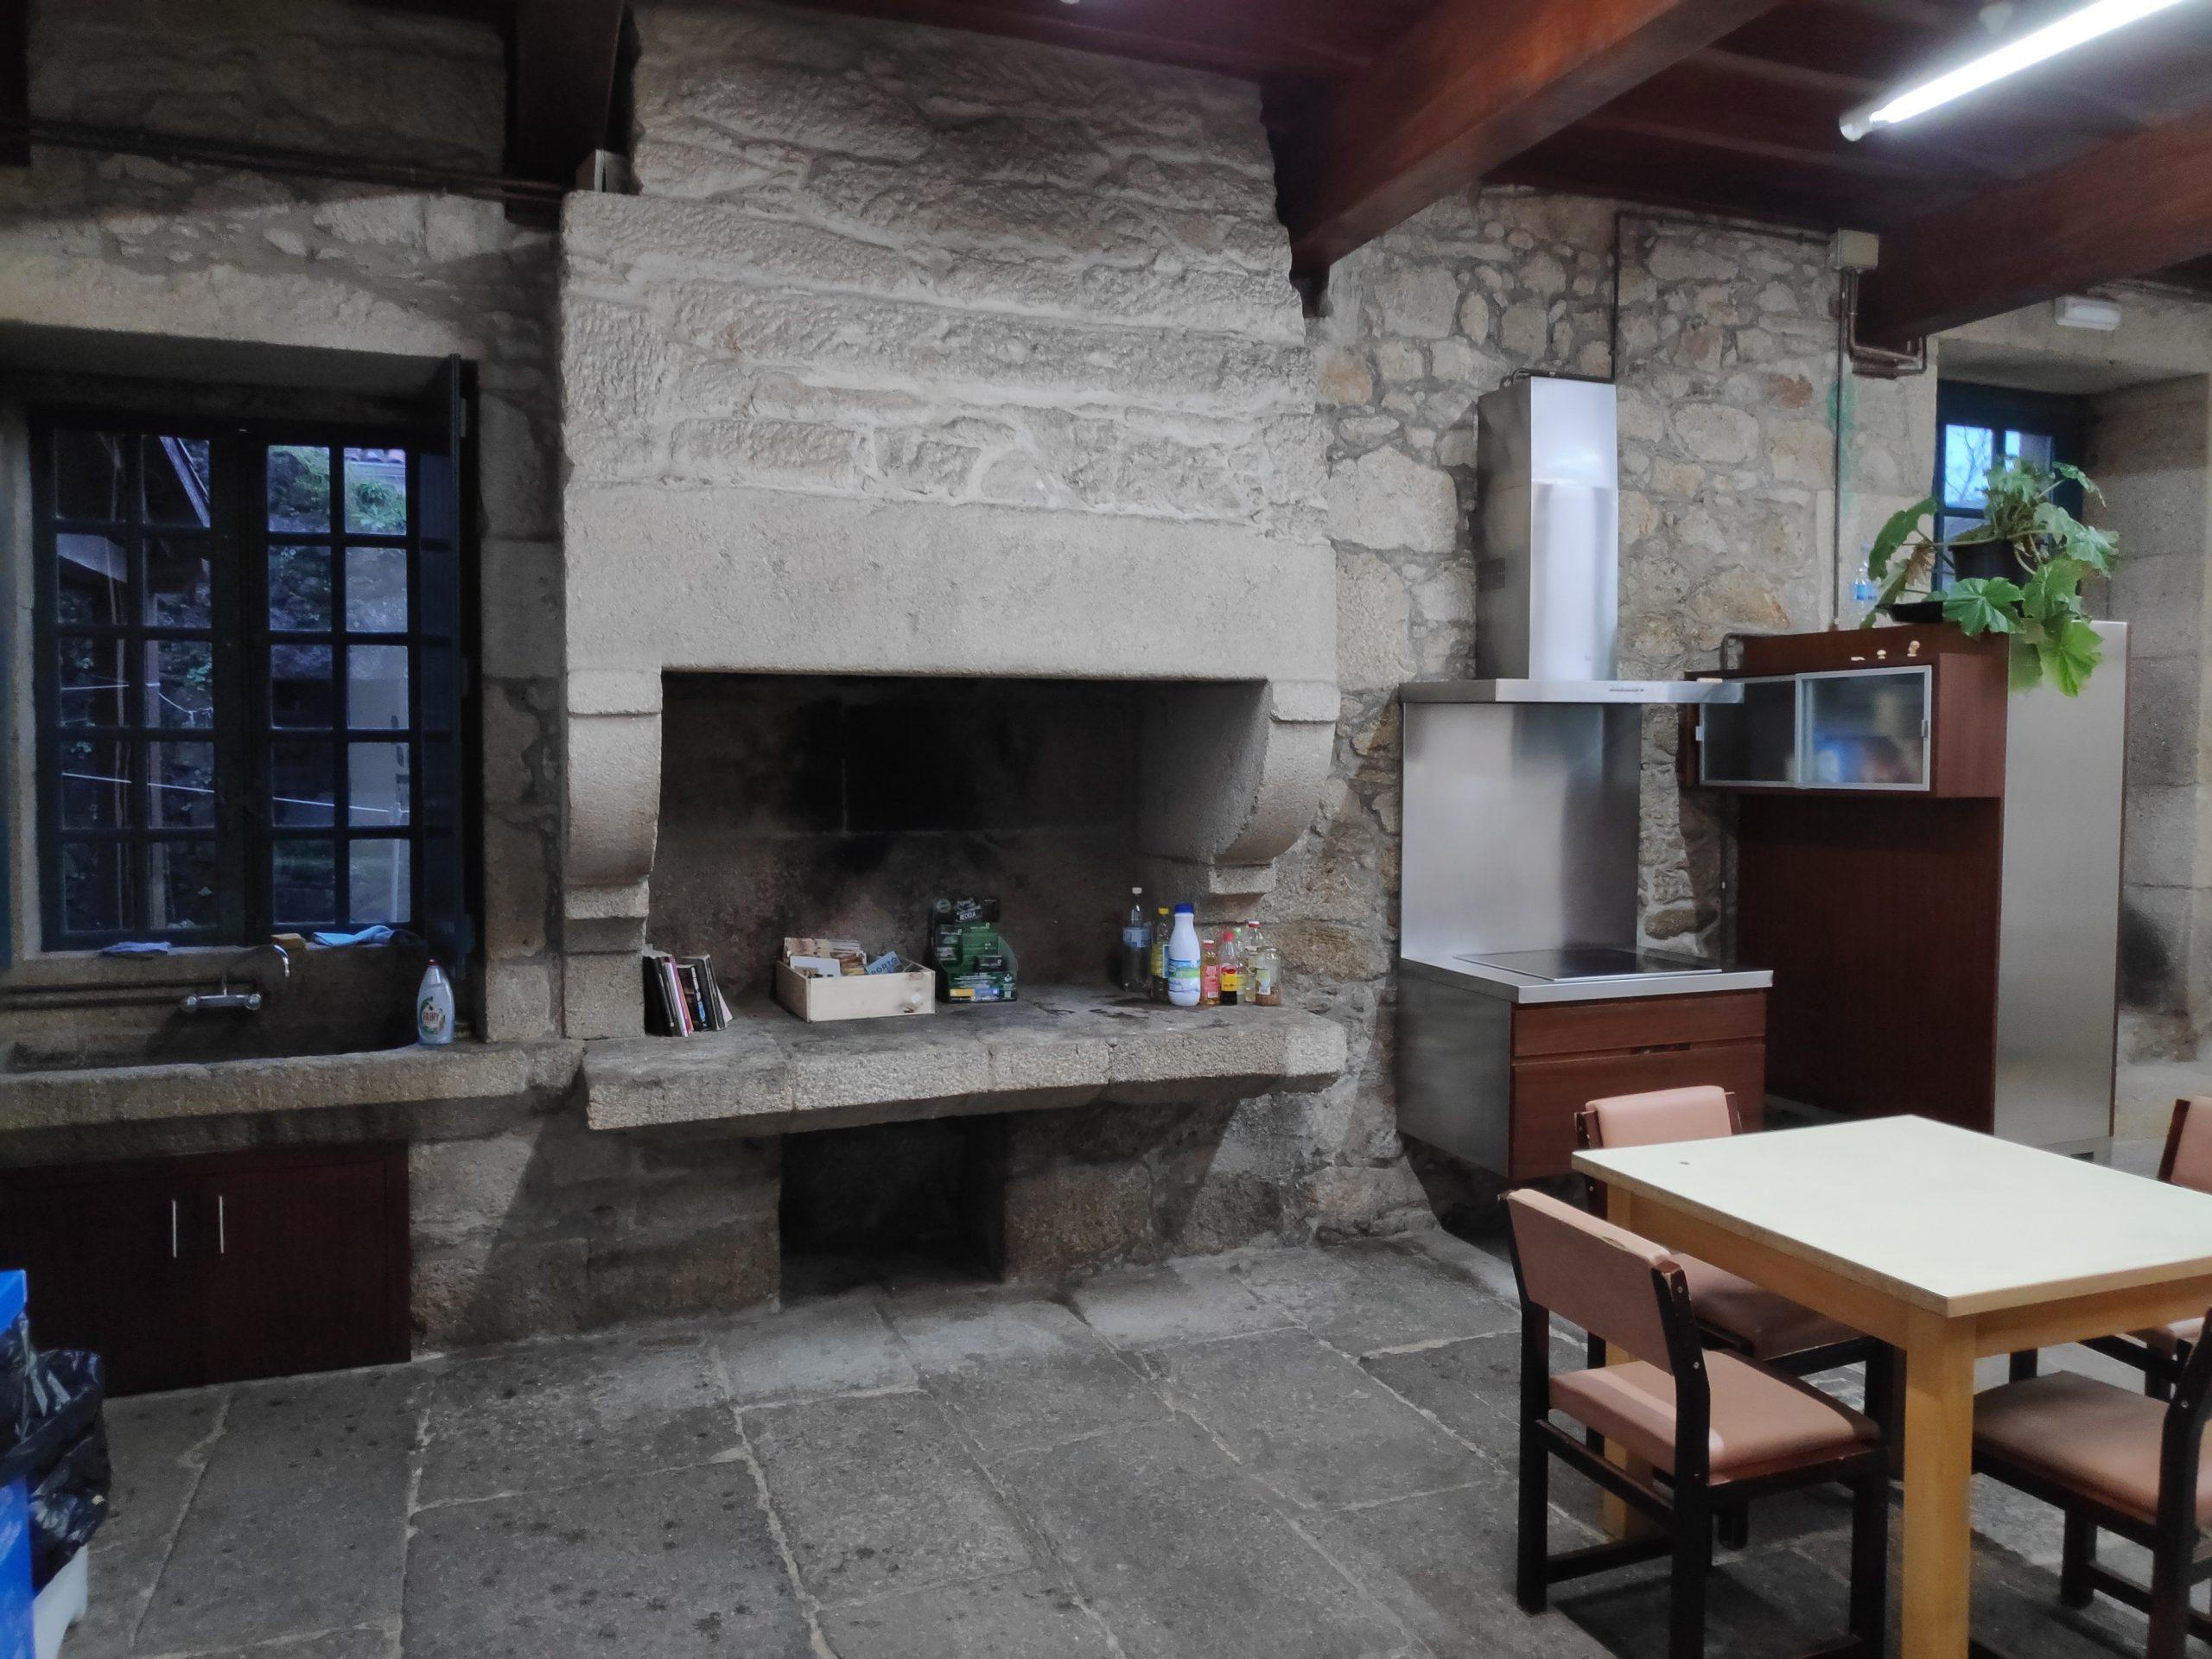 Kitchen area was quite impressive.